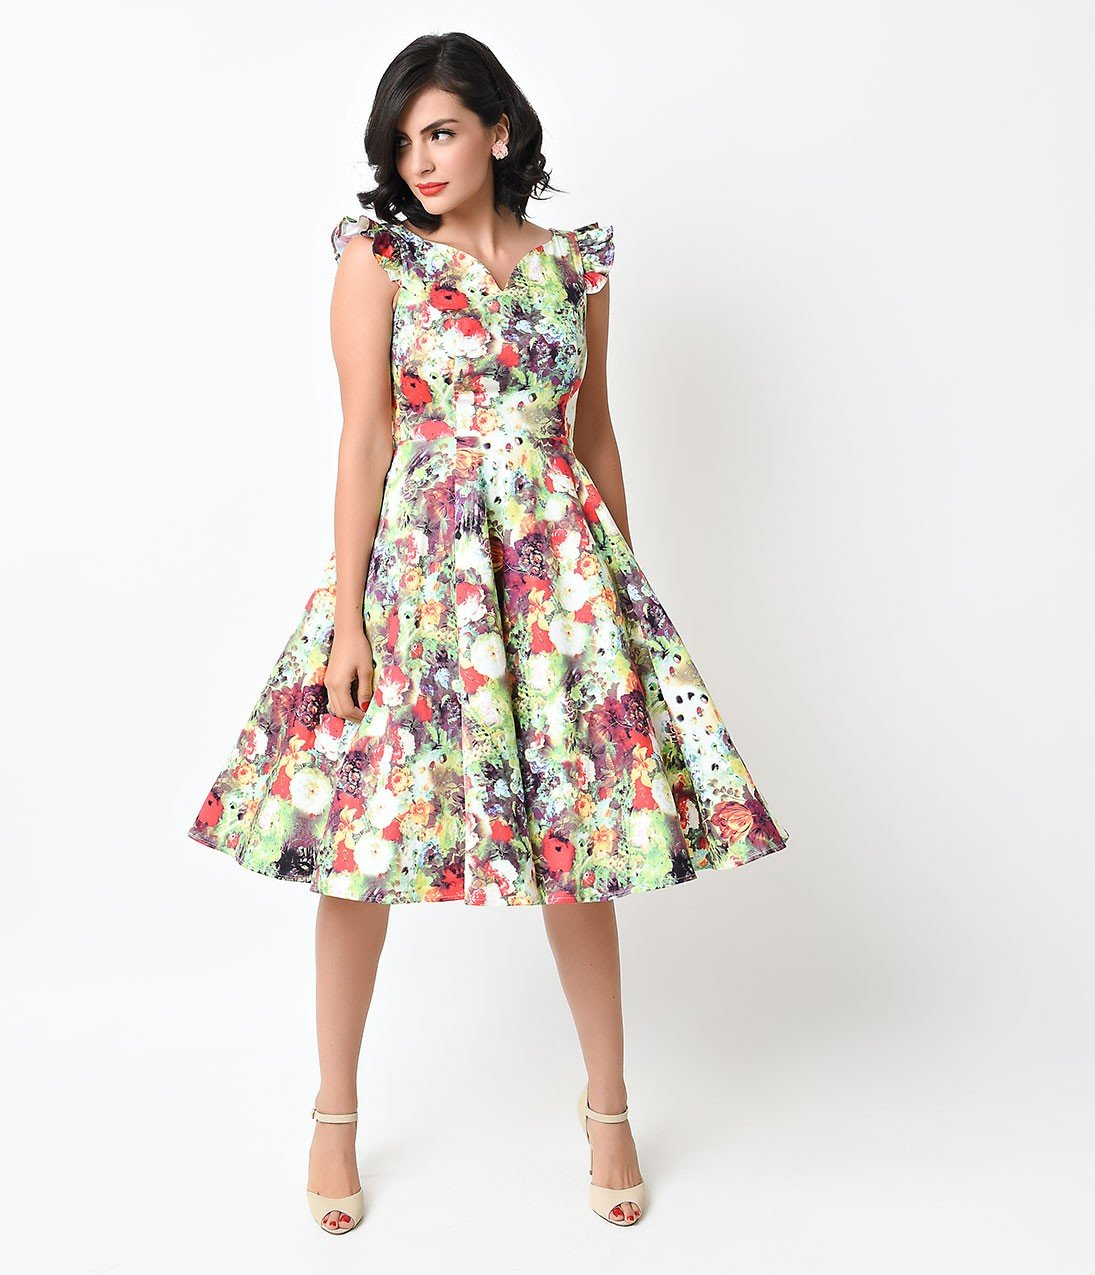 фото в стиляги модели стиле платьев